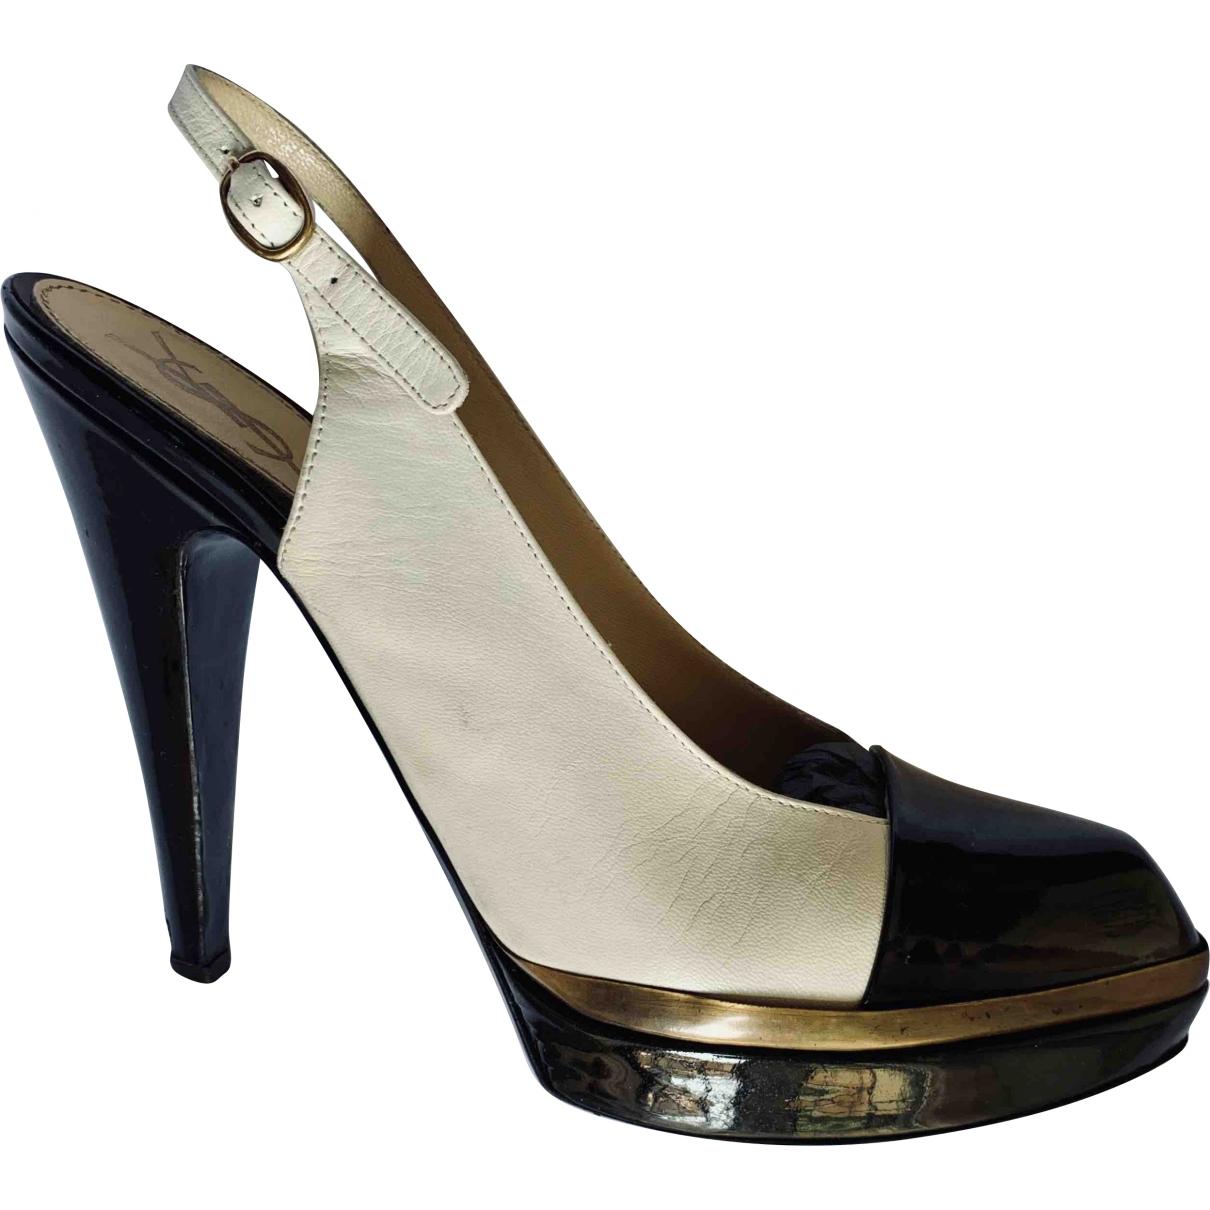 Yves Saint Laurent \N White Patent leather Heels for Women 40 EU